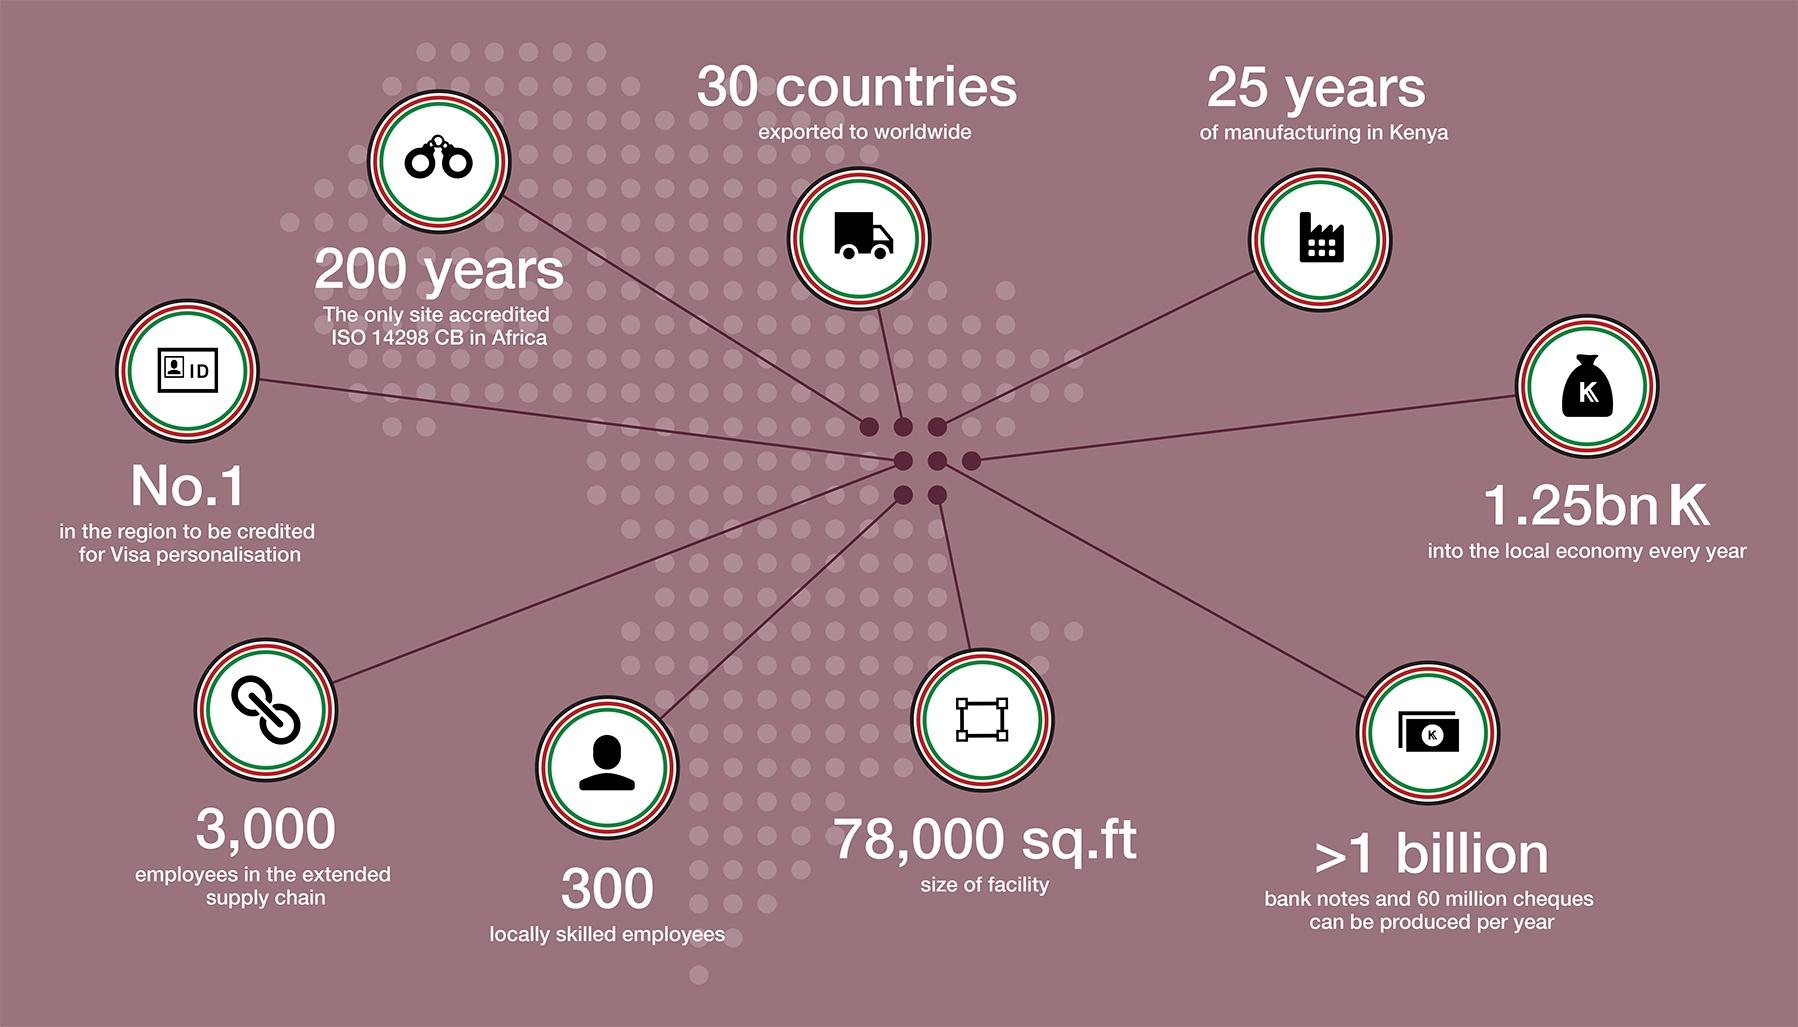 kenya_infographic.jpg